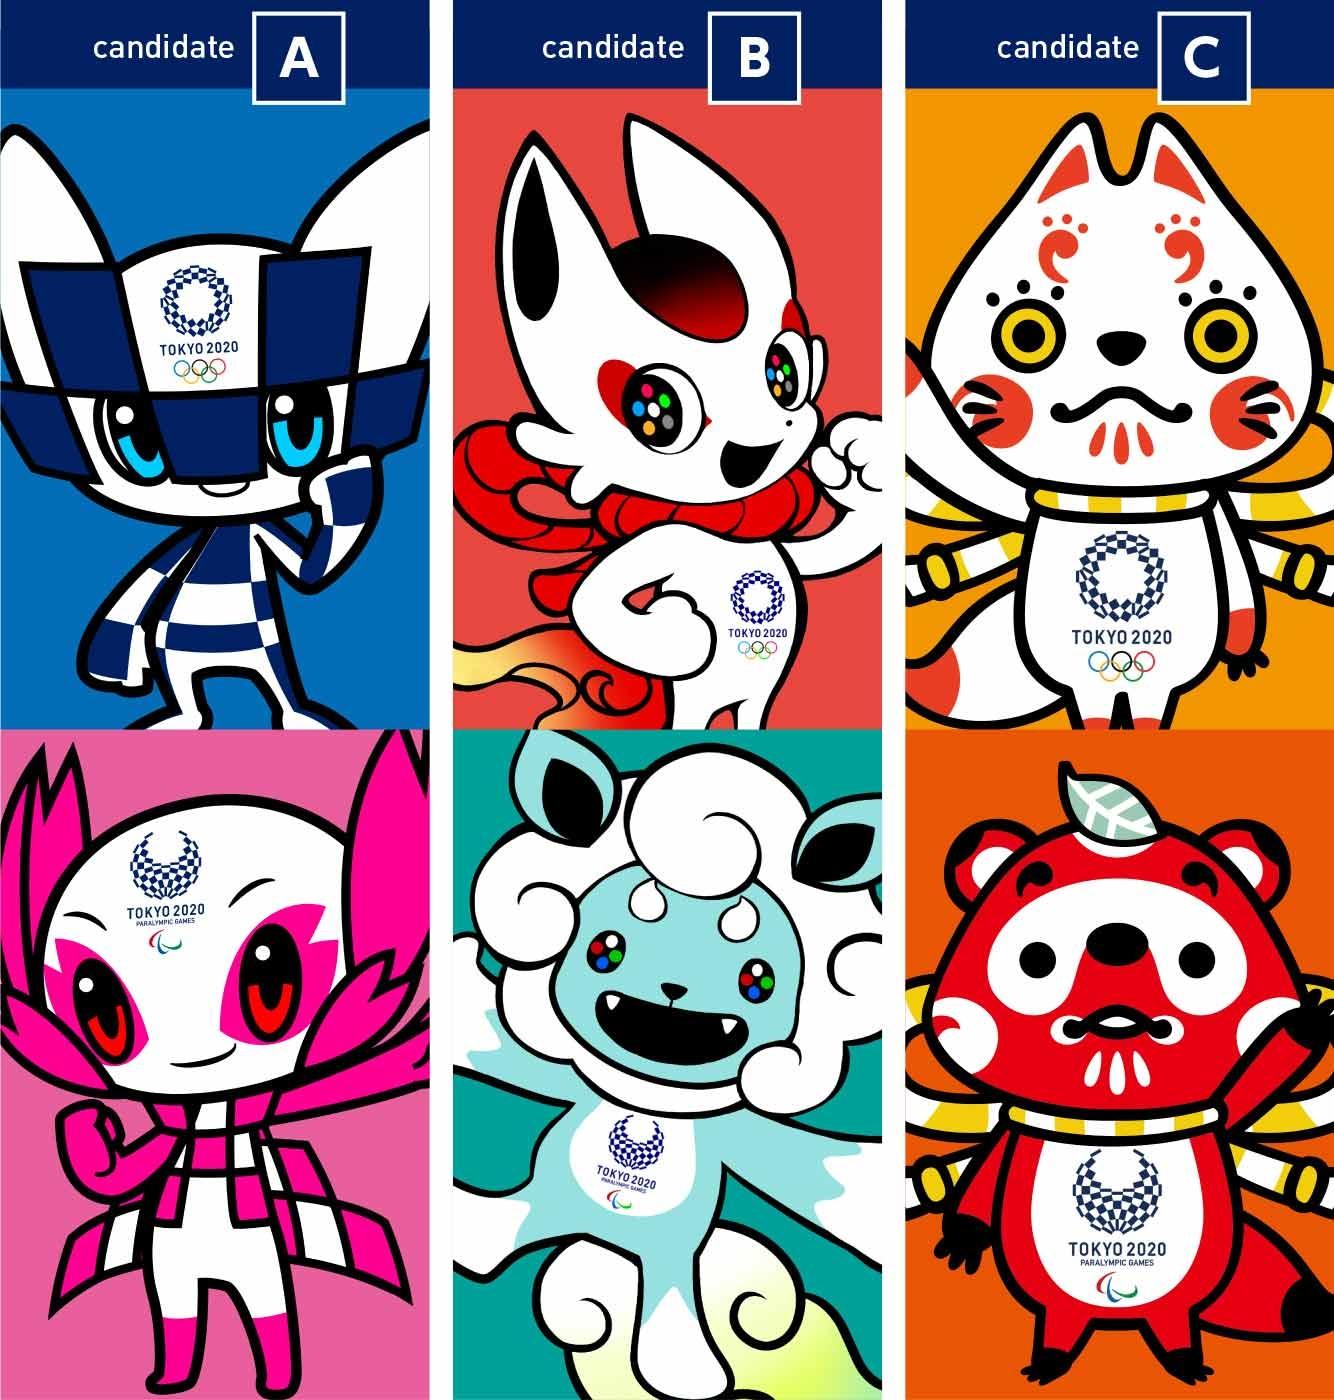 Tokyo 2020 Mascot Candidates